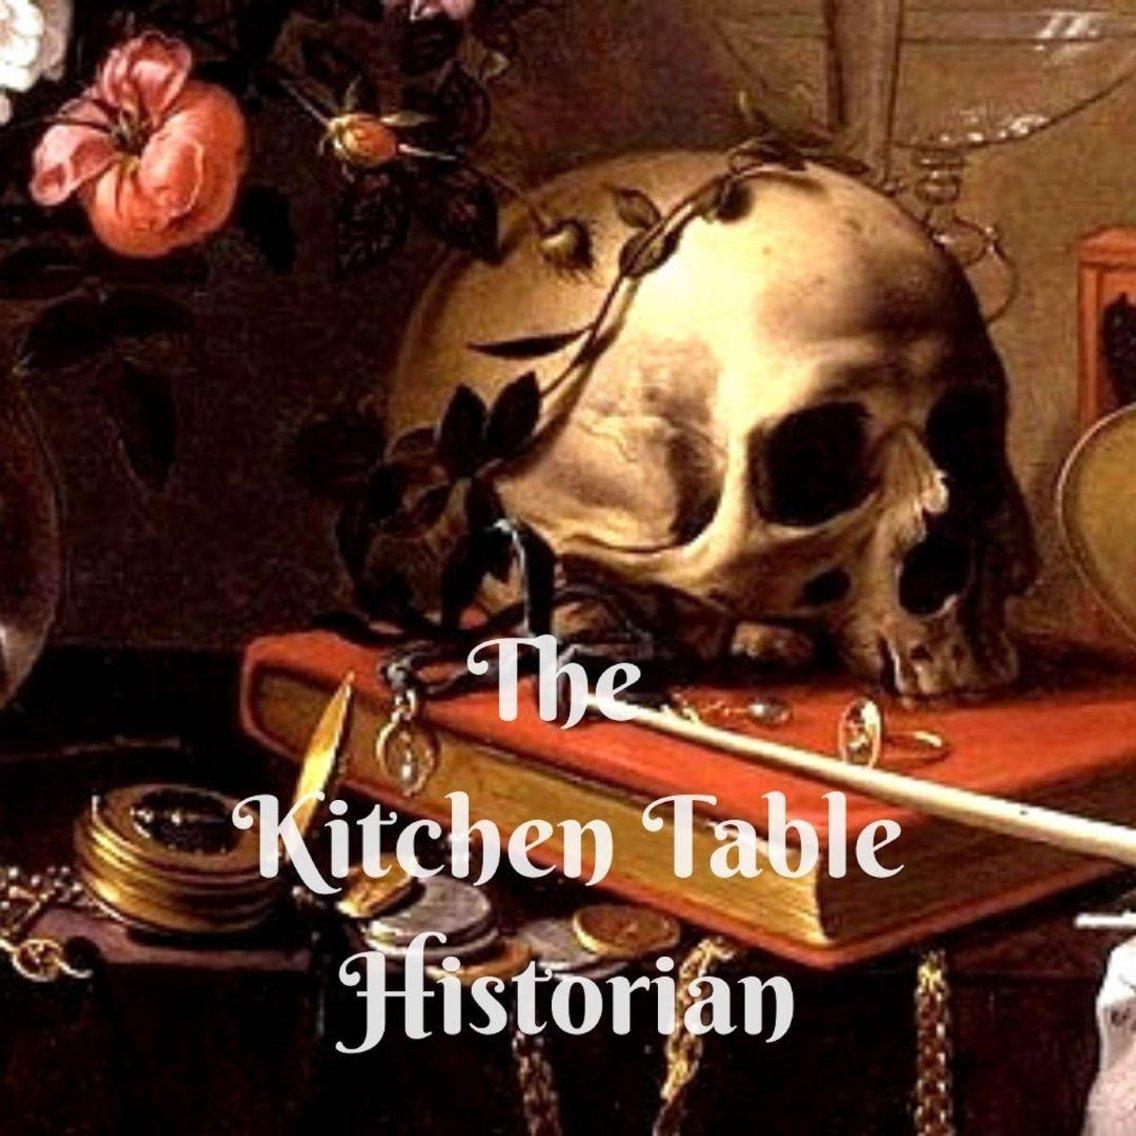 The Kitchen Table Historian - imagen de portada